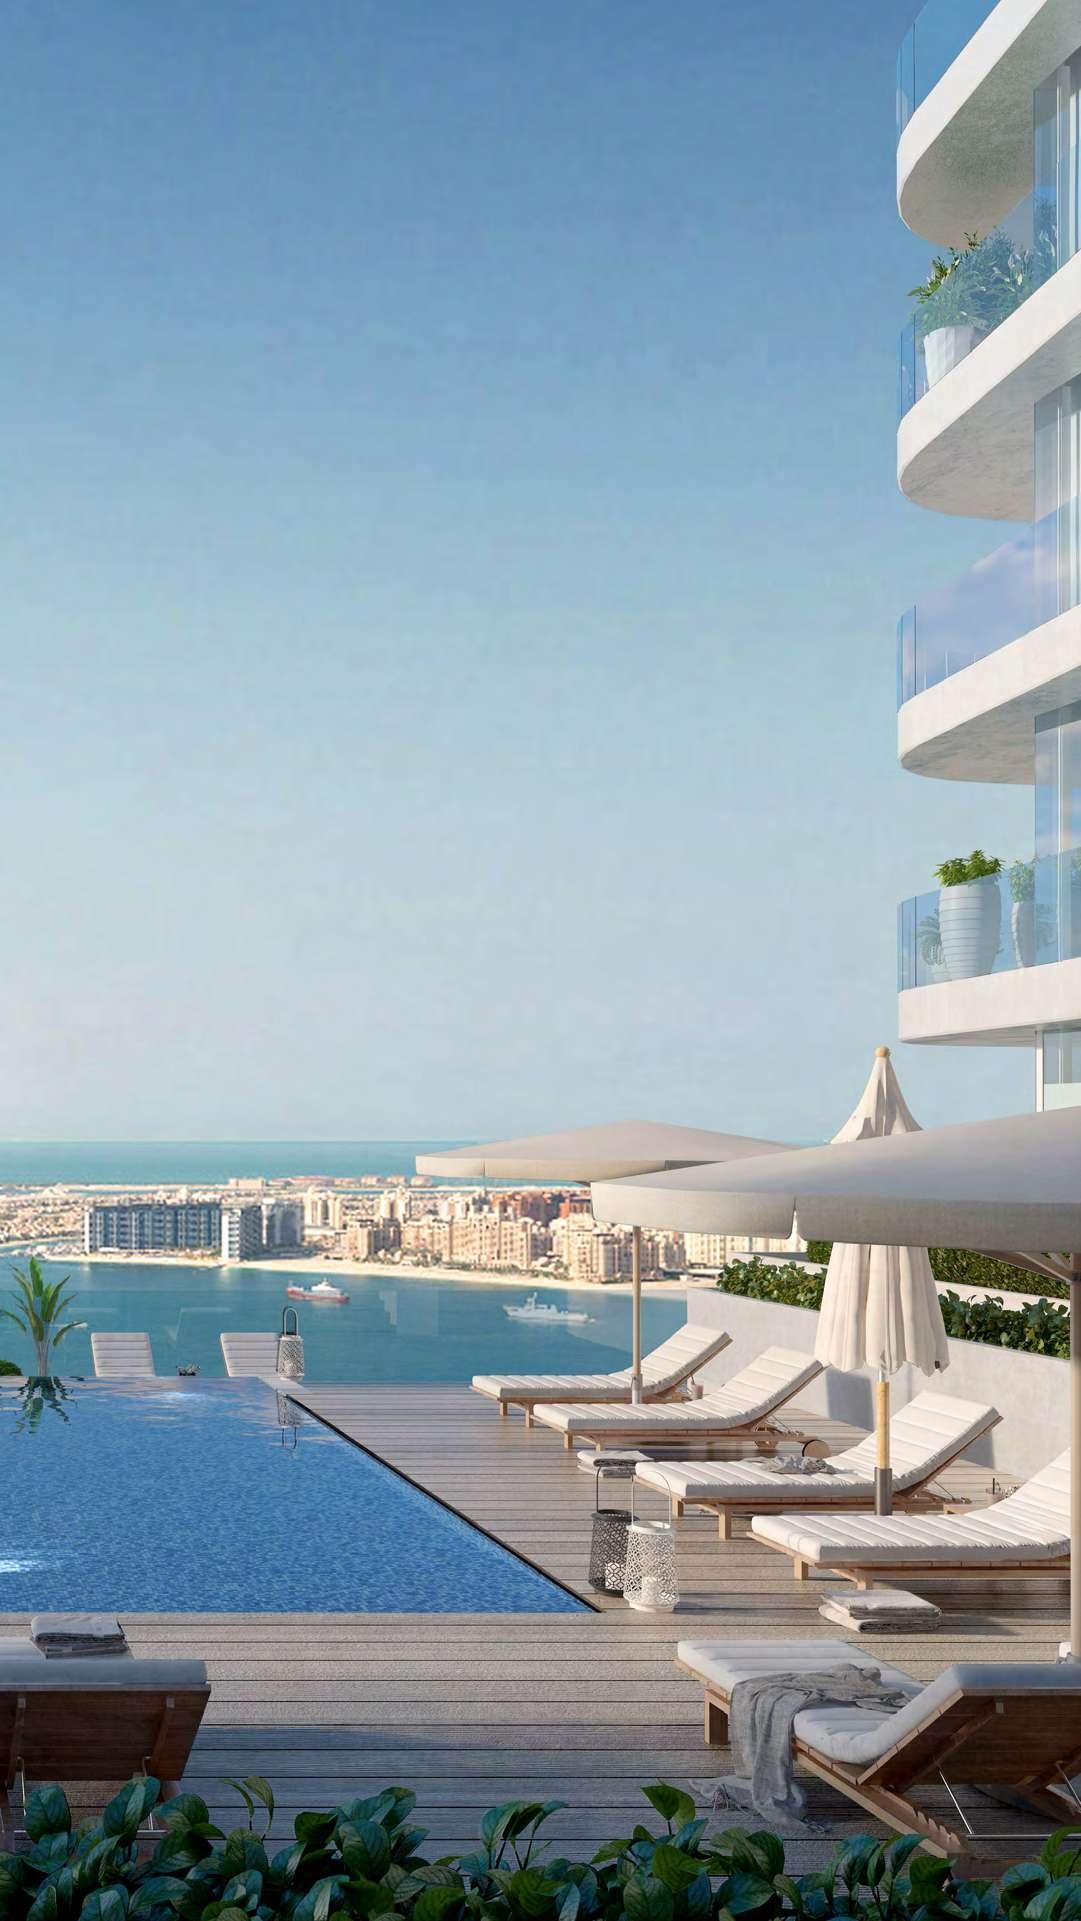 PRIVATE BEACH LIVING/ Marina Vista at Emaa